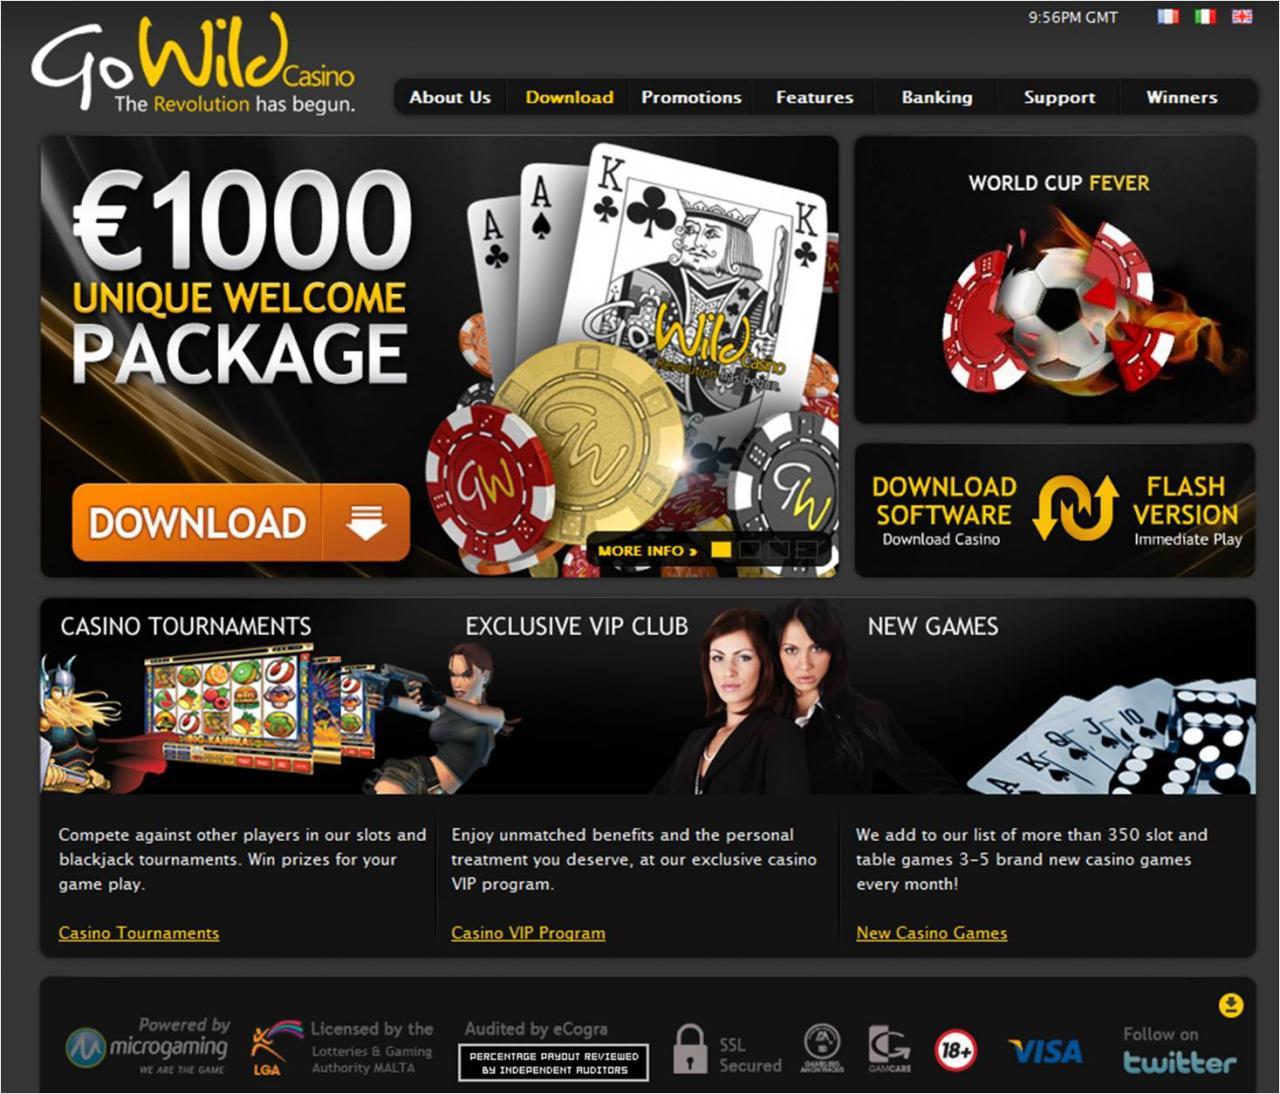 Go Wild Mobile Casino No Deposit